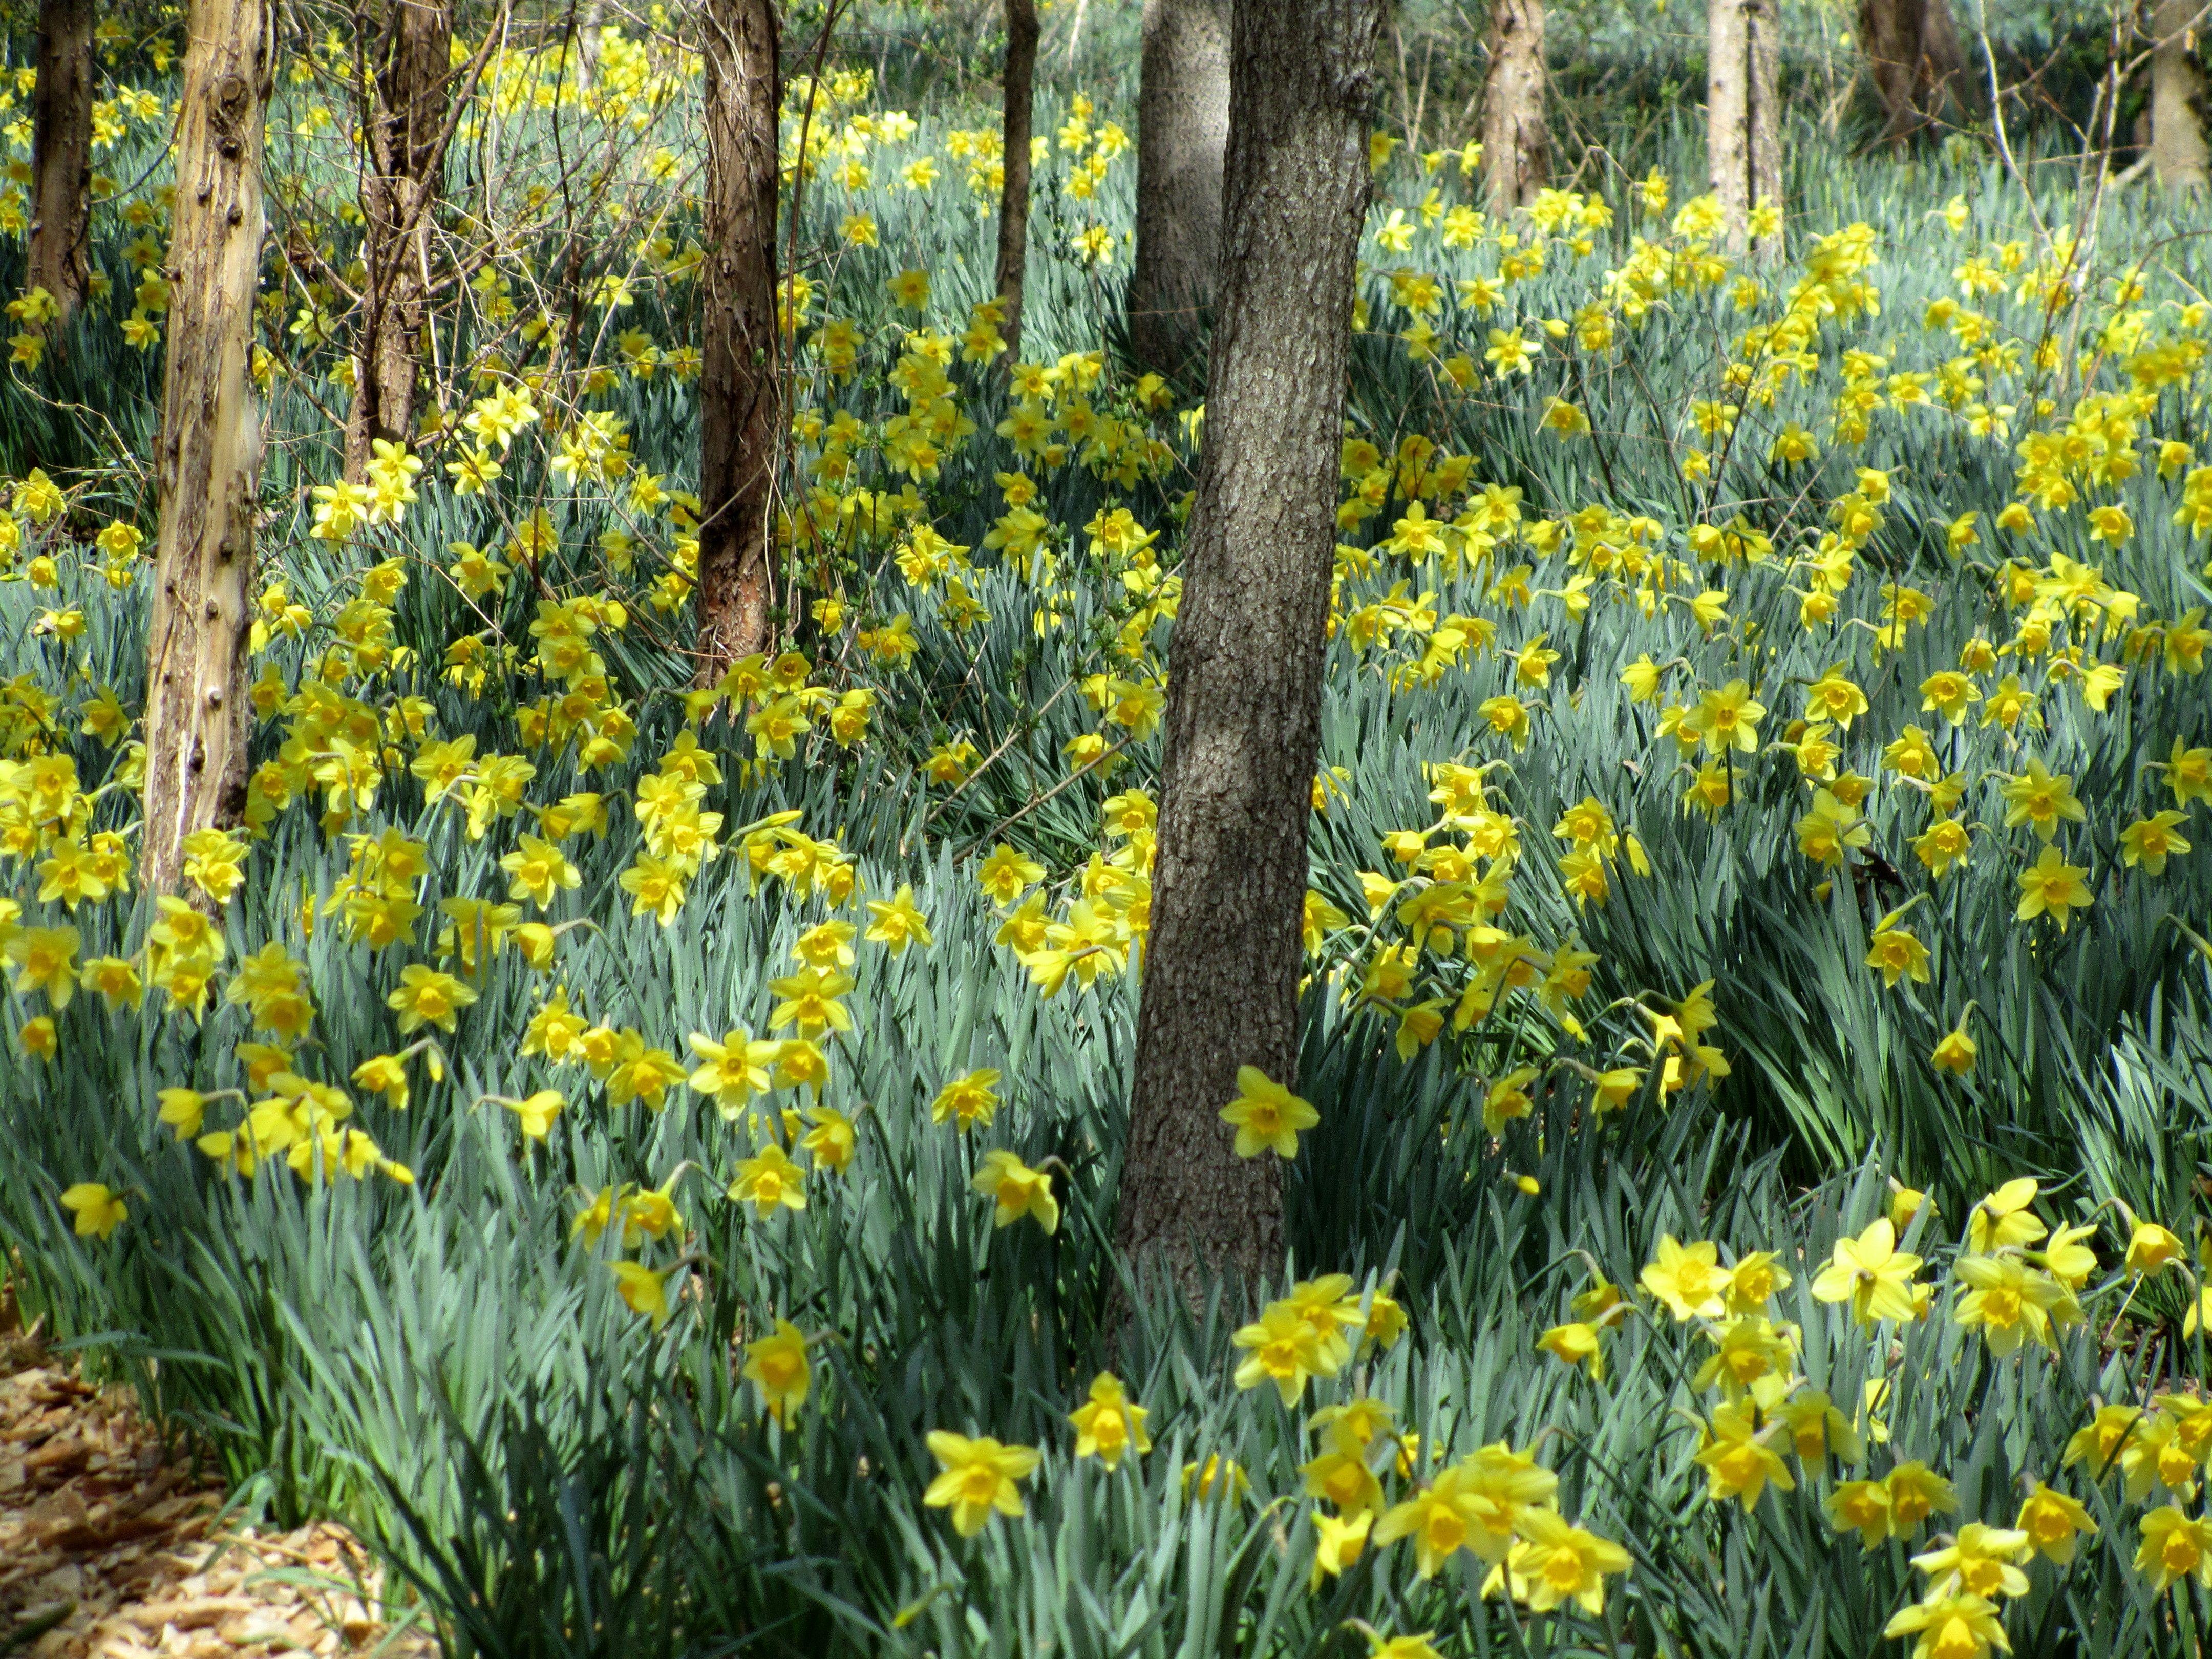 wild daffodil field in dartmouth ma garden wild daffodil field in dartmouth ma